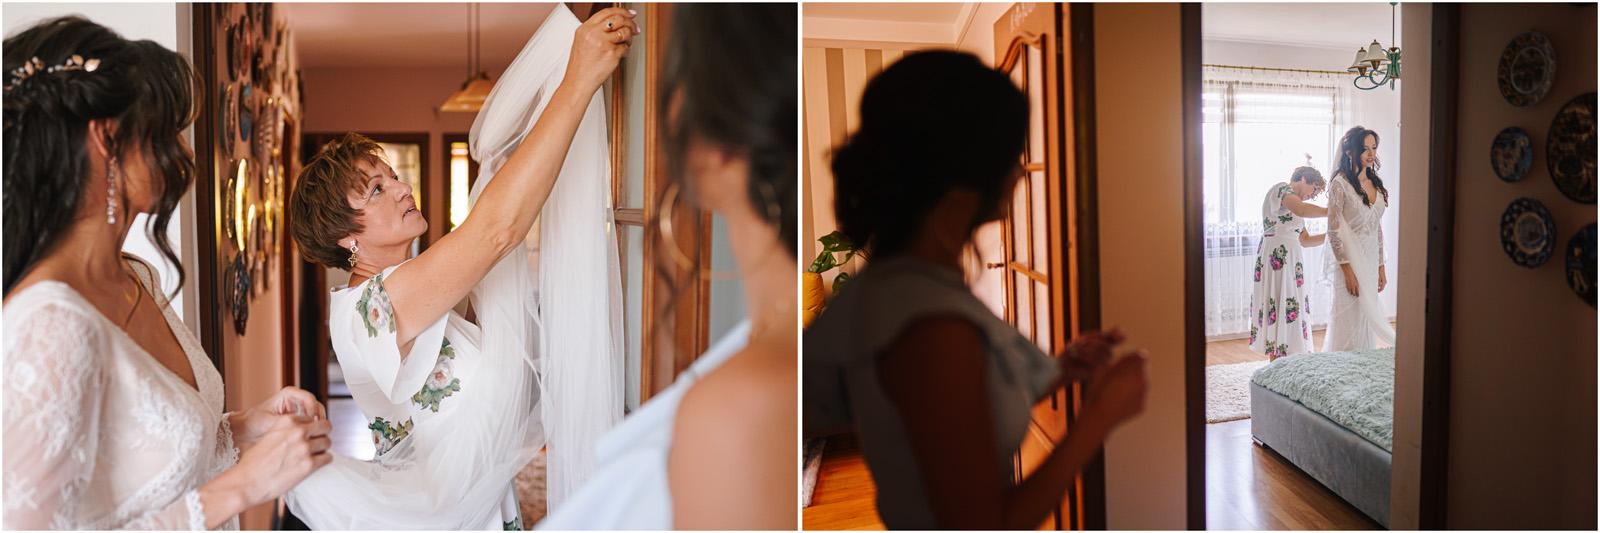 Ania & Mateusz | boho wesele w Stodole pod Kasztanami 15